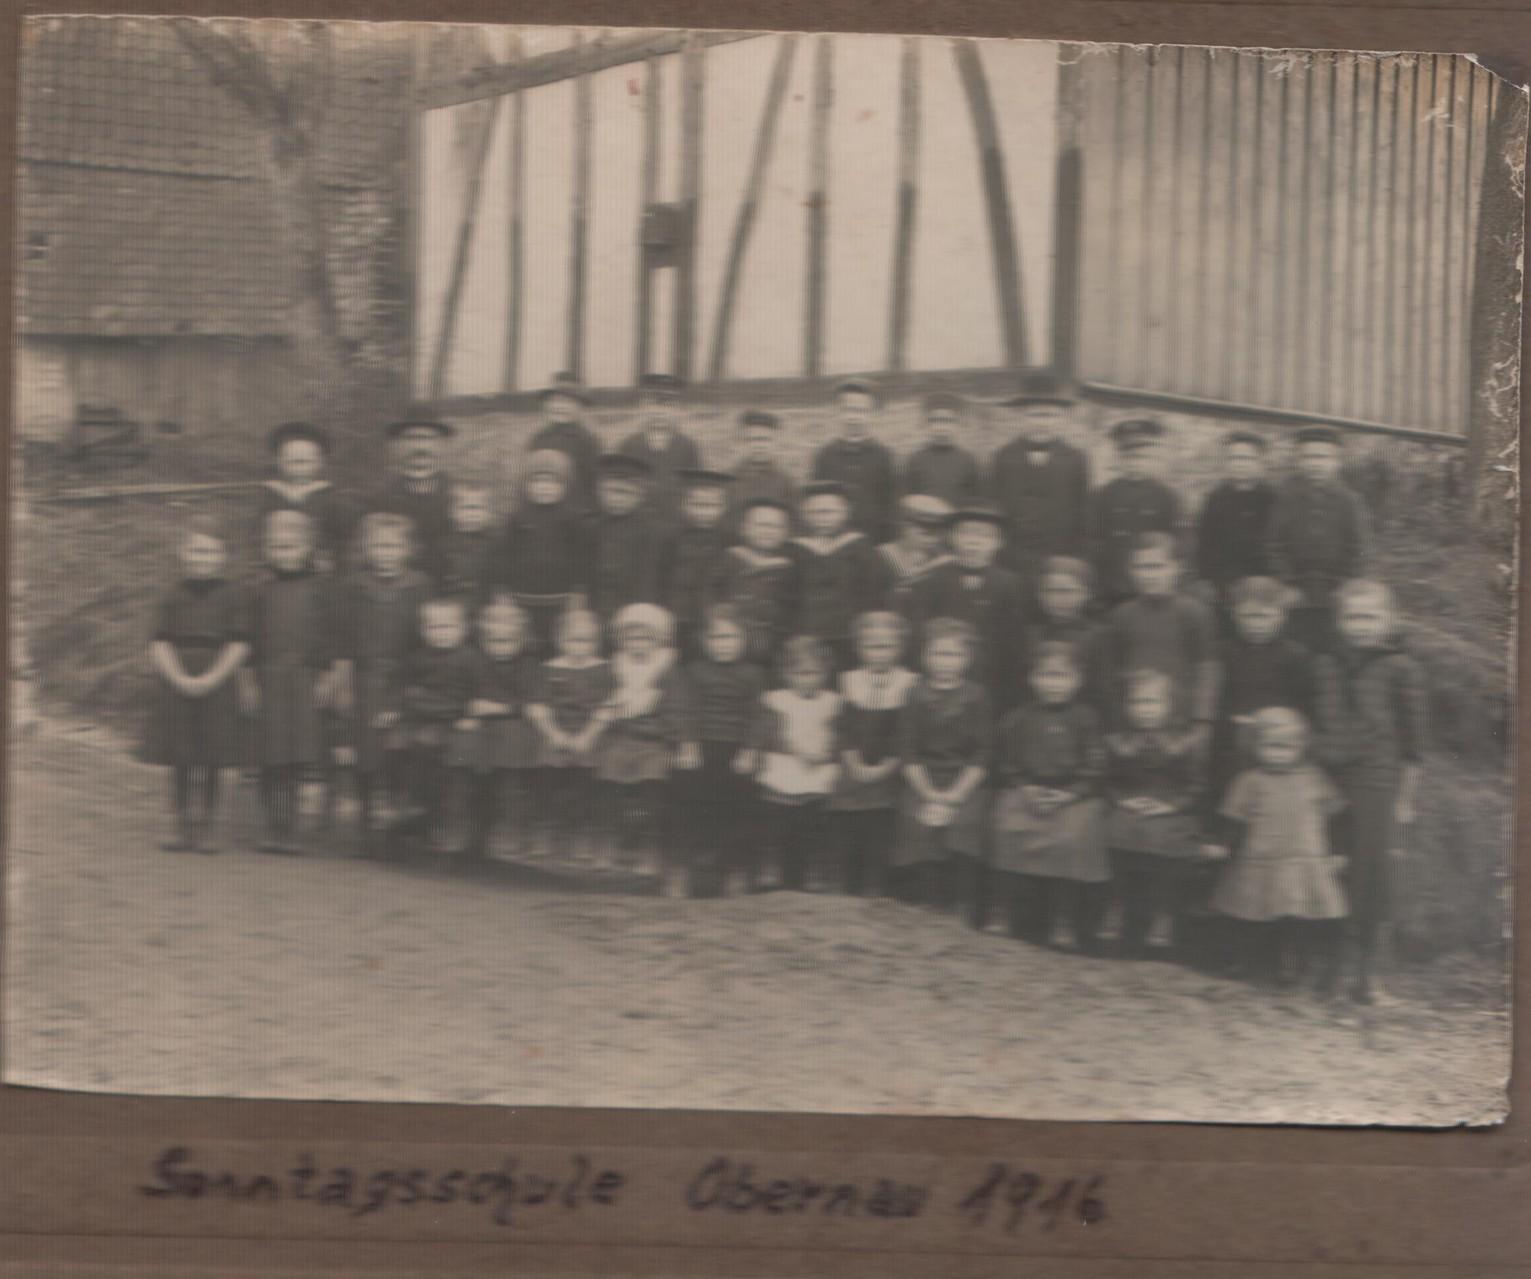 Sonntagschule 1916